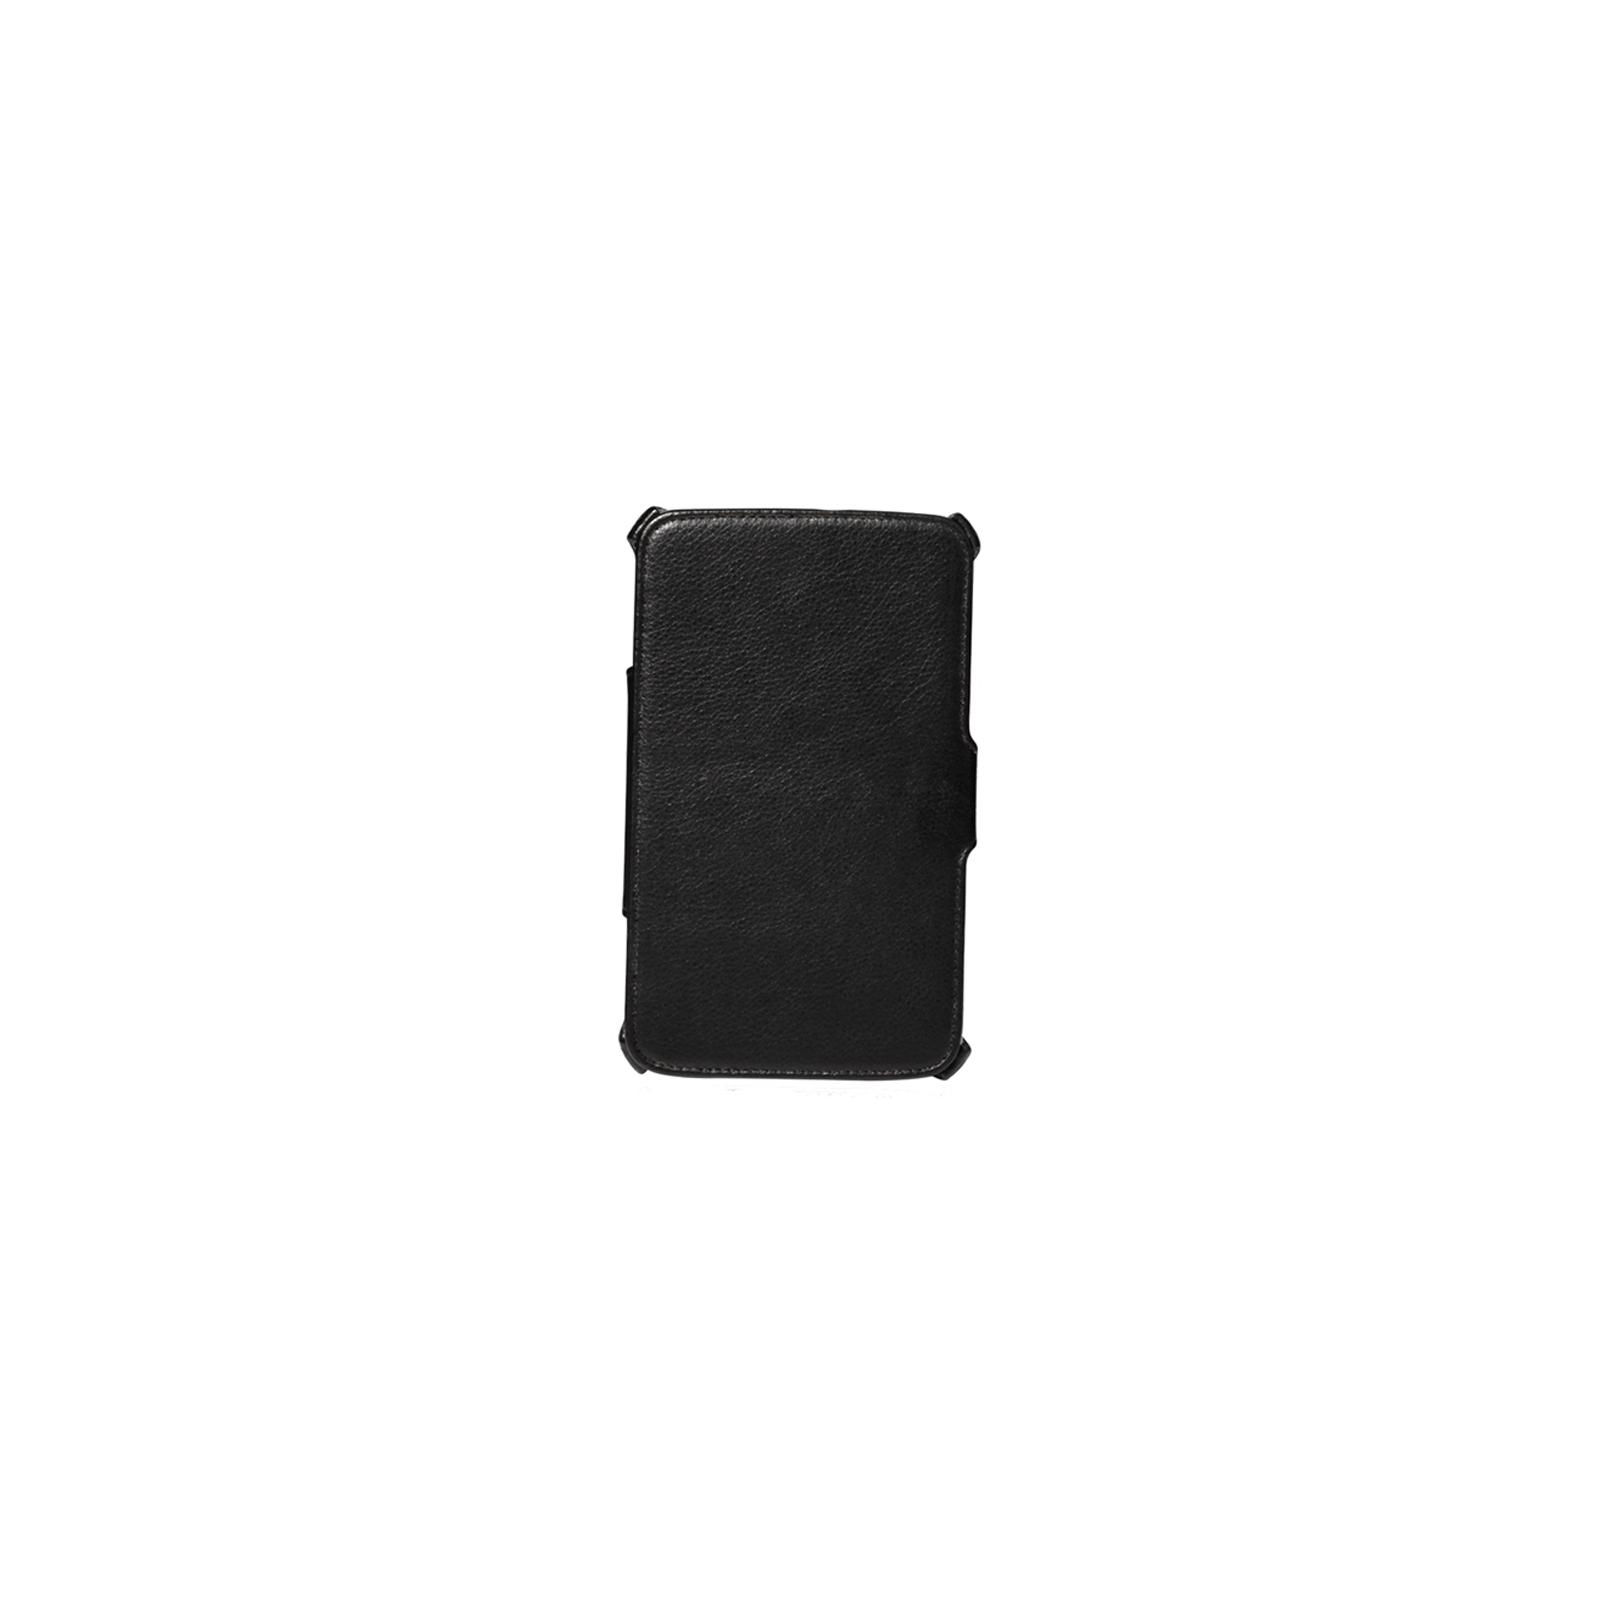 Чехол для планшета AirOn для Samsung Galaxy Tab 3 7'' black (6946795824954) изображение 4